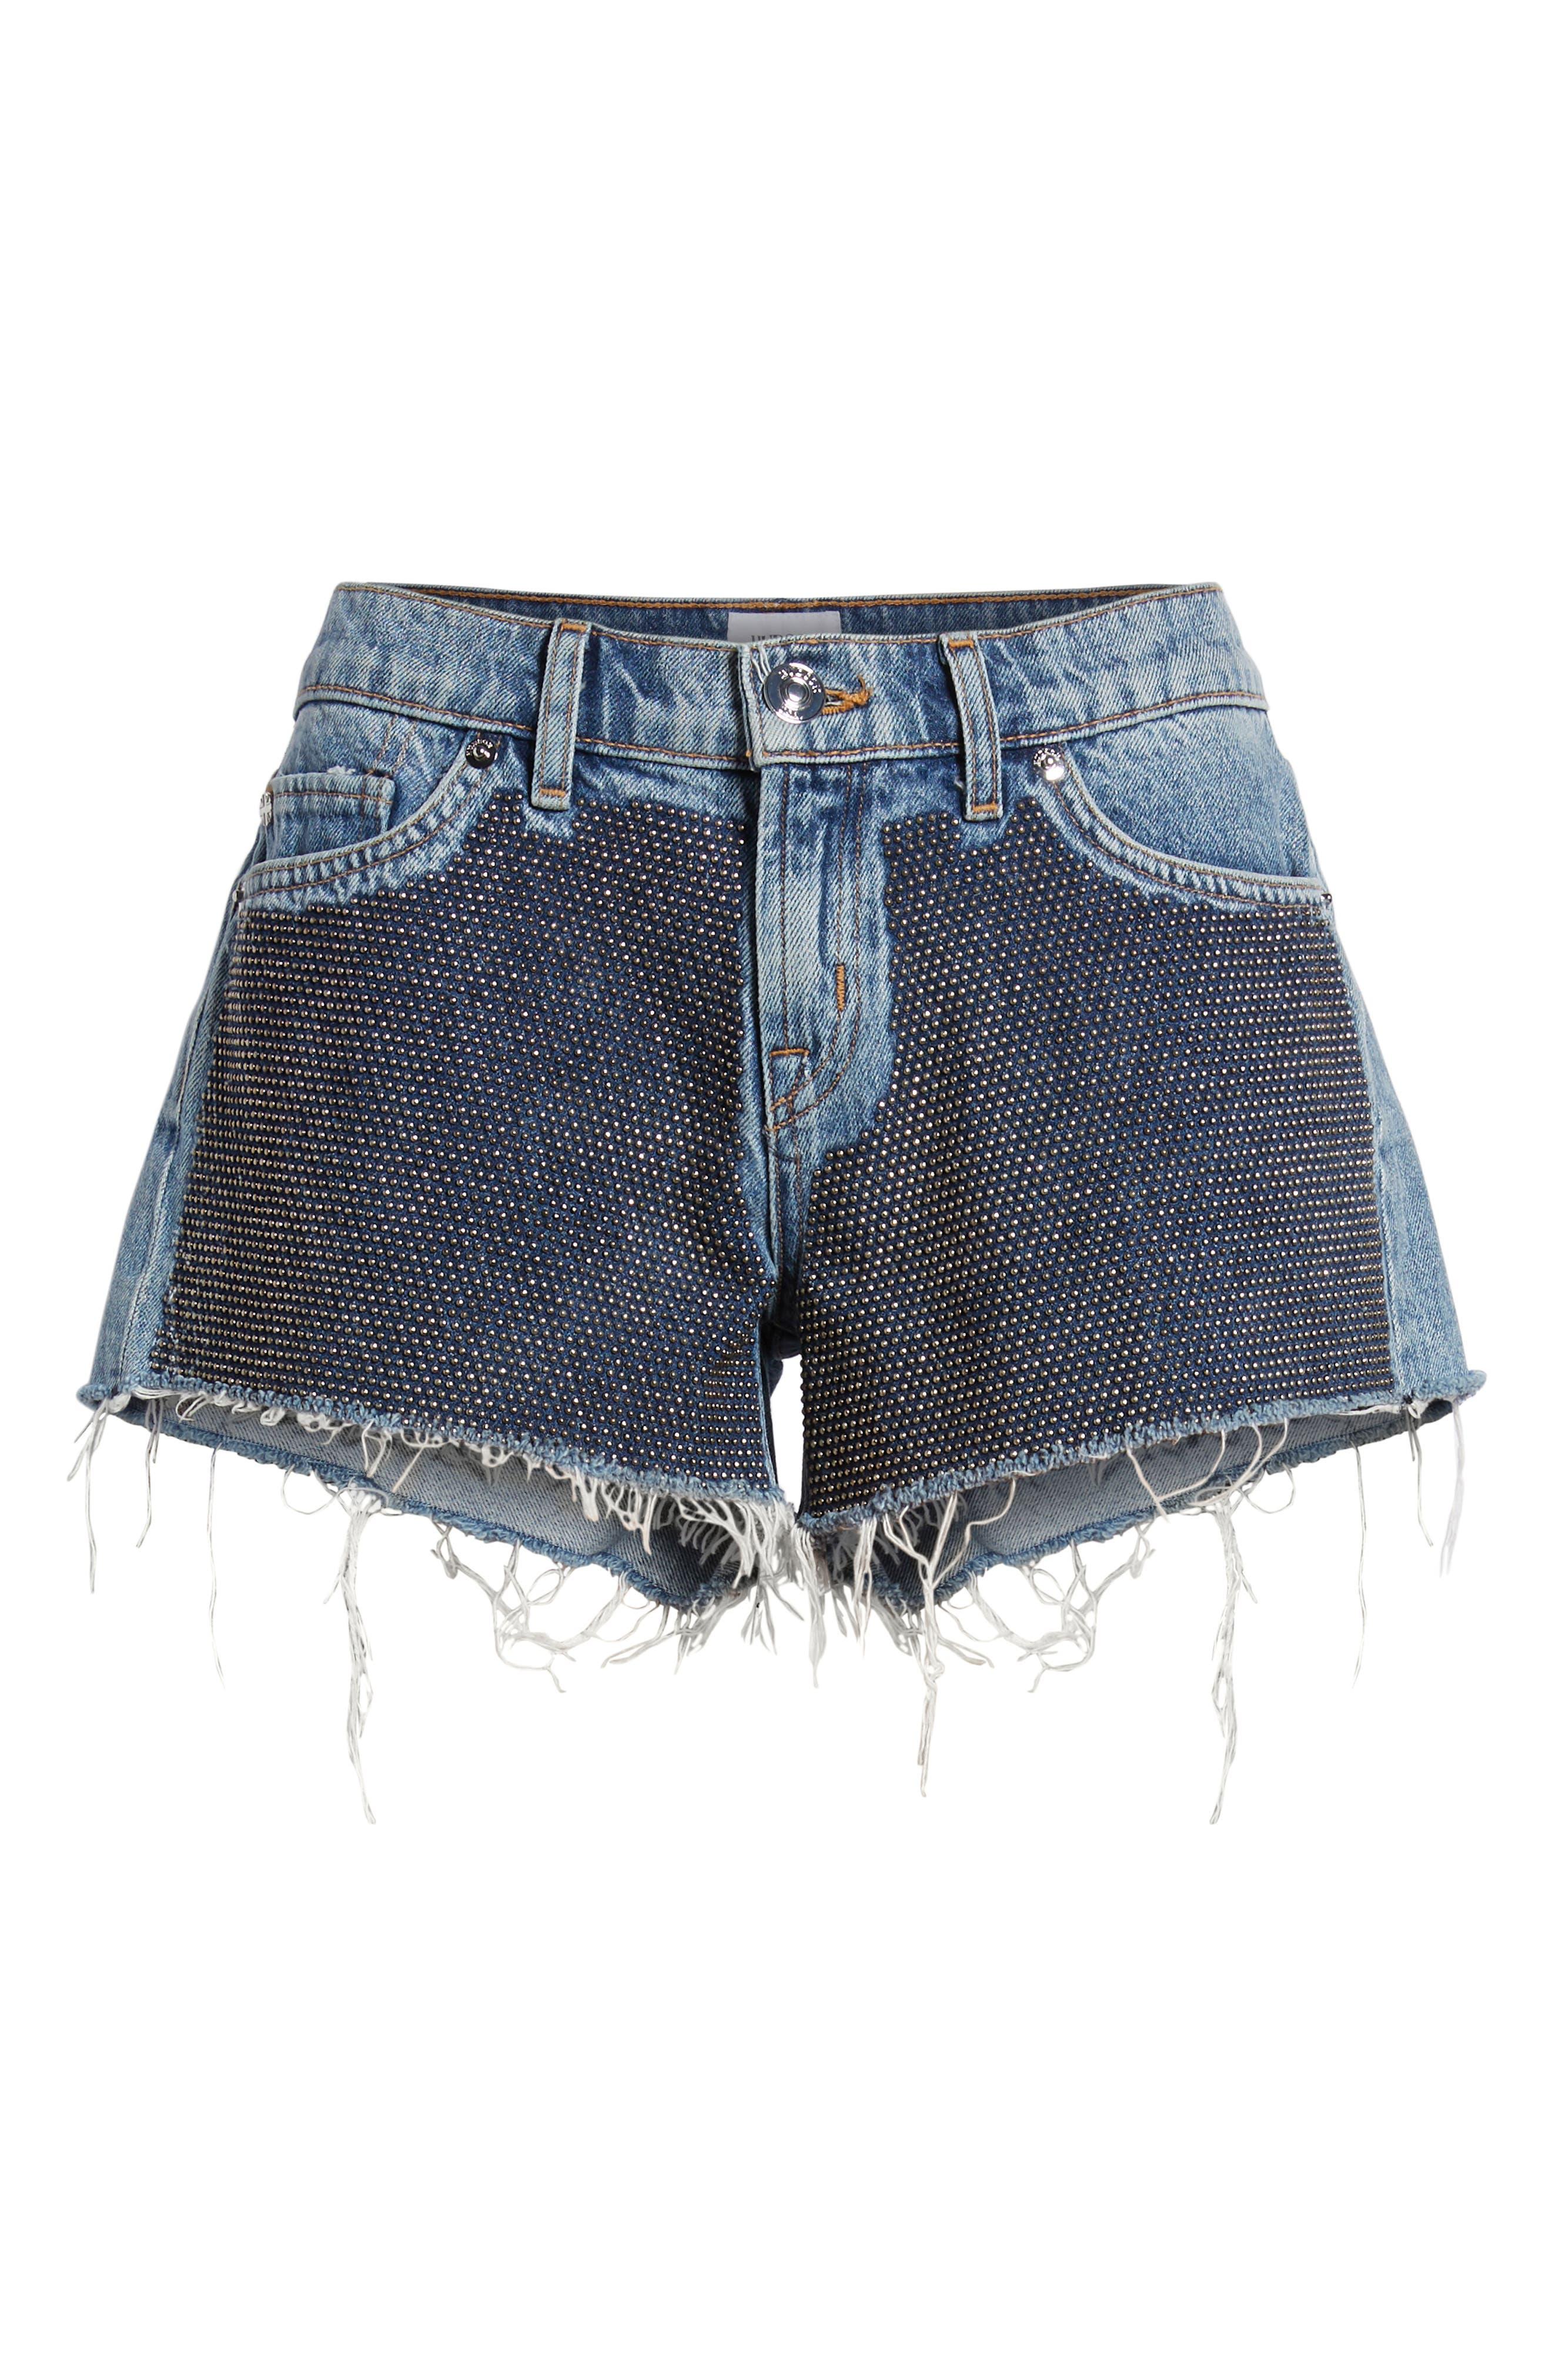 Kenzie Studded Cutoff Denim Shorts,                             Alternate thumbnail 7, color,                             Metal Mark